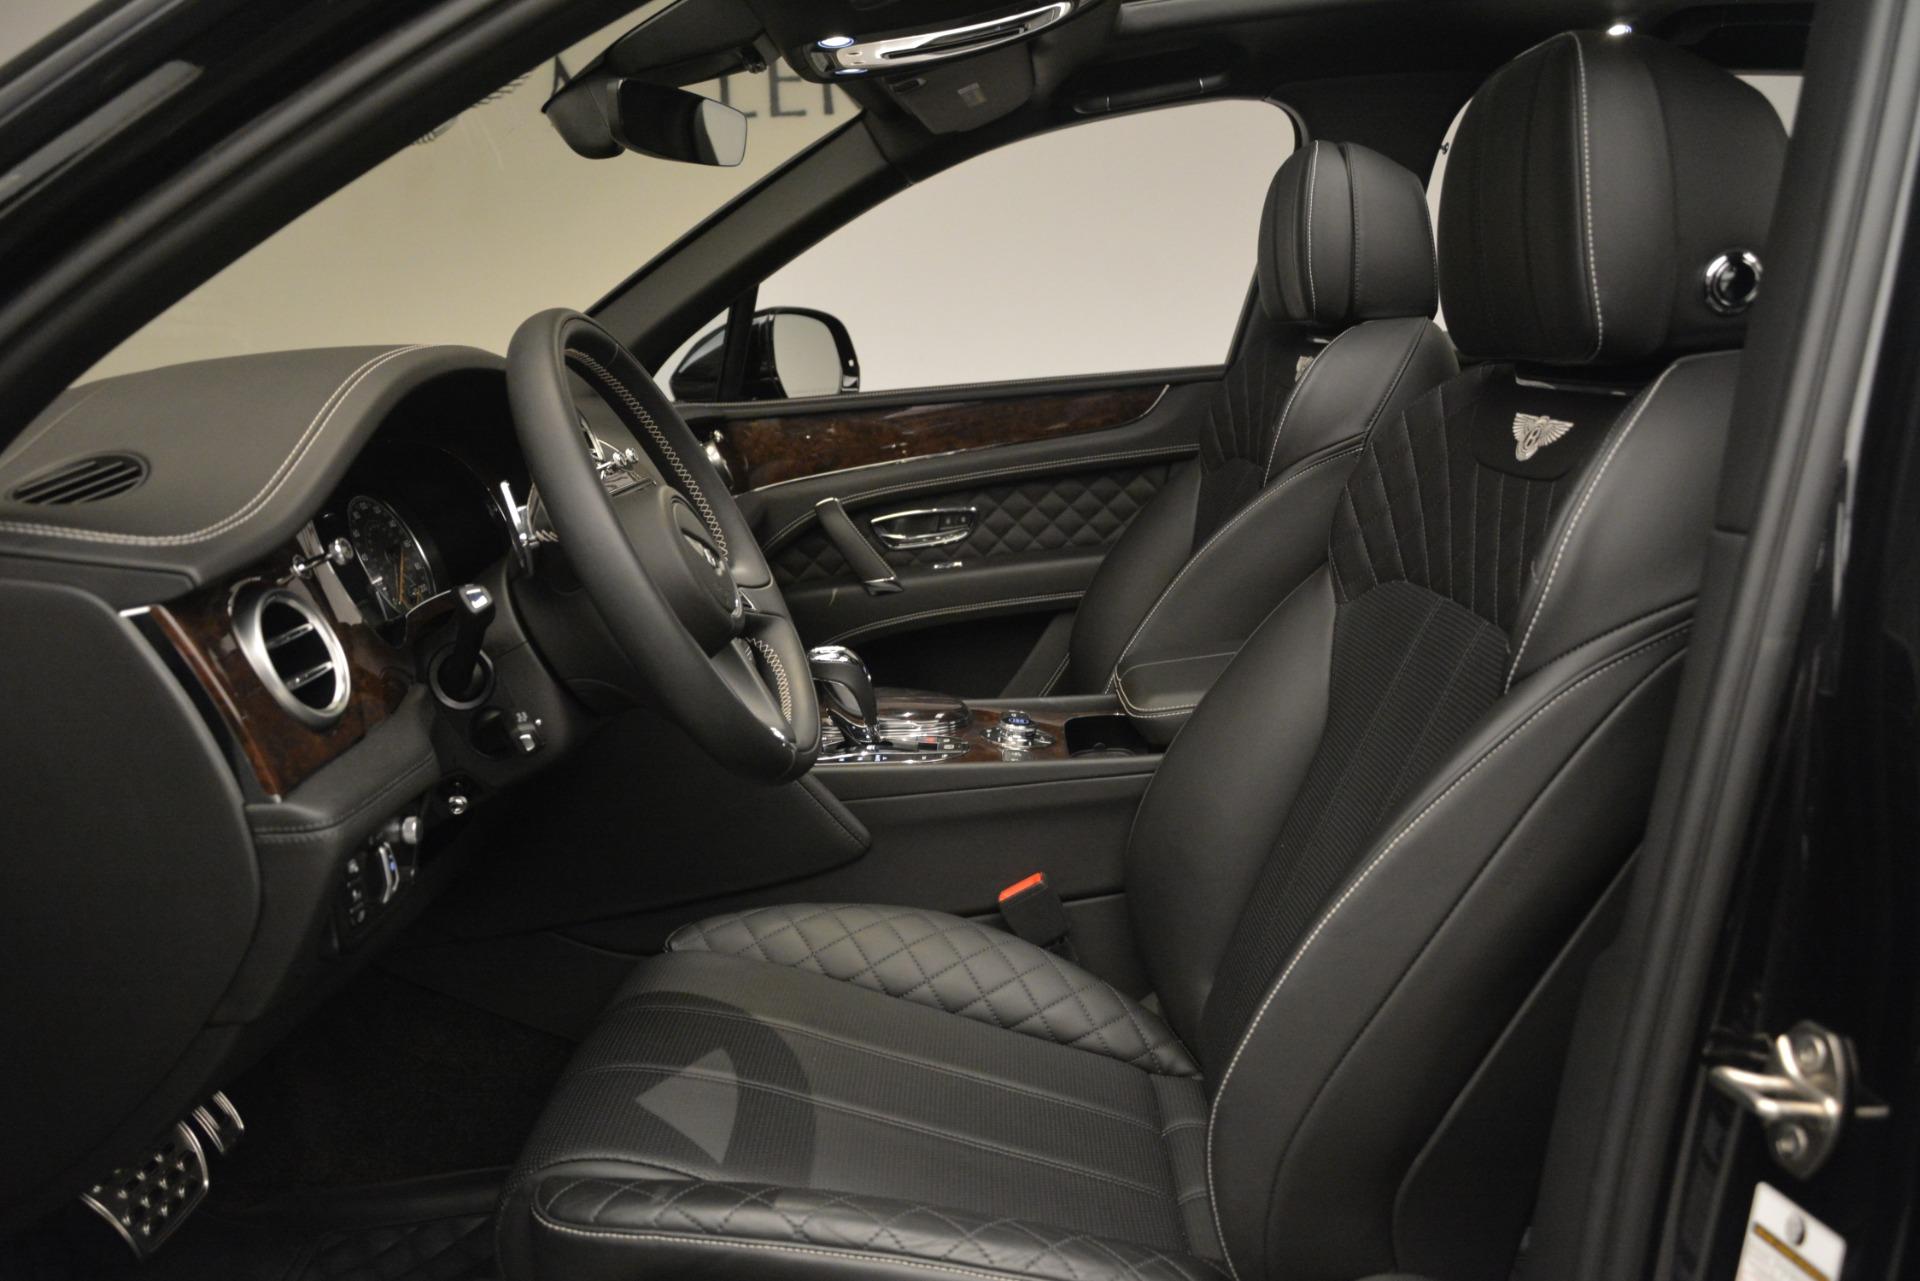 Used 2017 Bentley Bentayga W12 For Sale In Greenwich, CT. Alfa Romeo of Greenwich, 7570 3239_p19